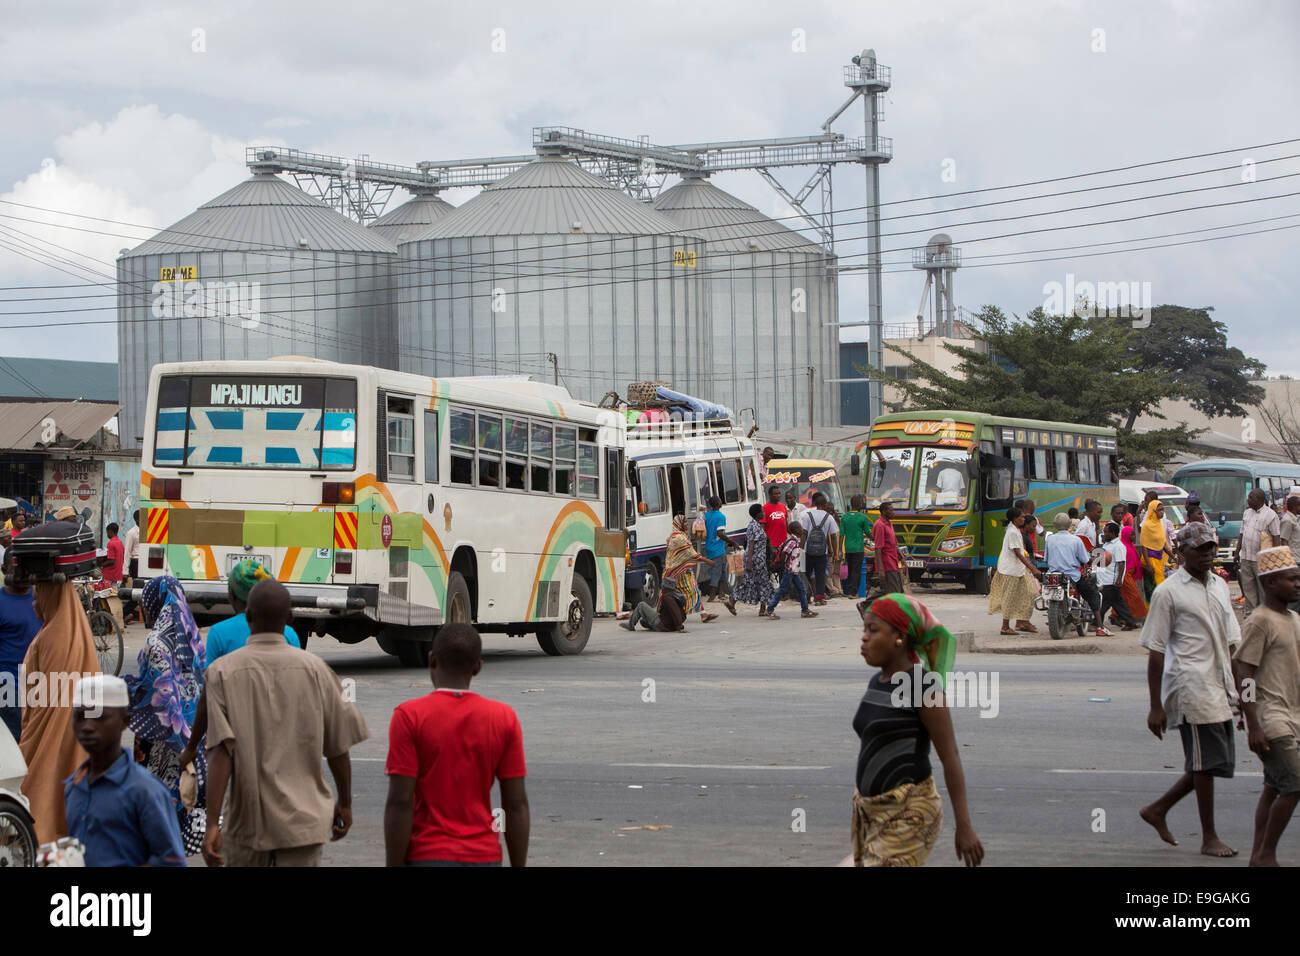 Busy street scene in Dar es Salaam, Tanzania, East Africa. - Stock Image